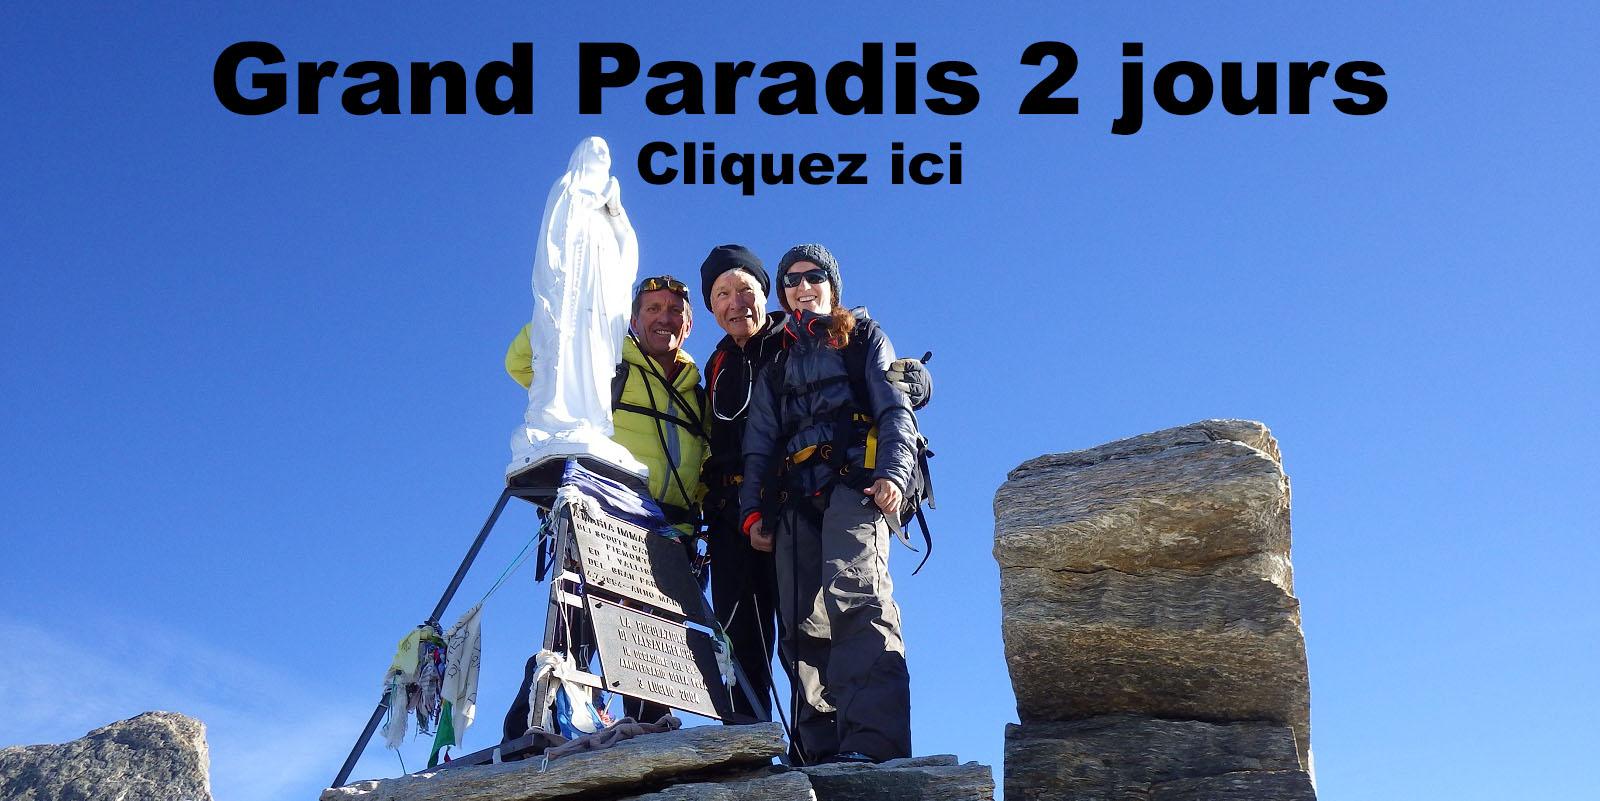 Grand Paradis 2 jours 1600x800